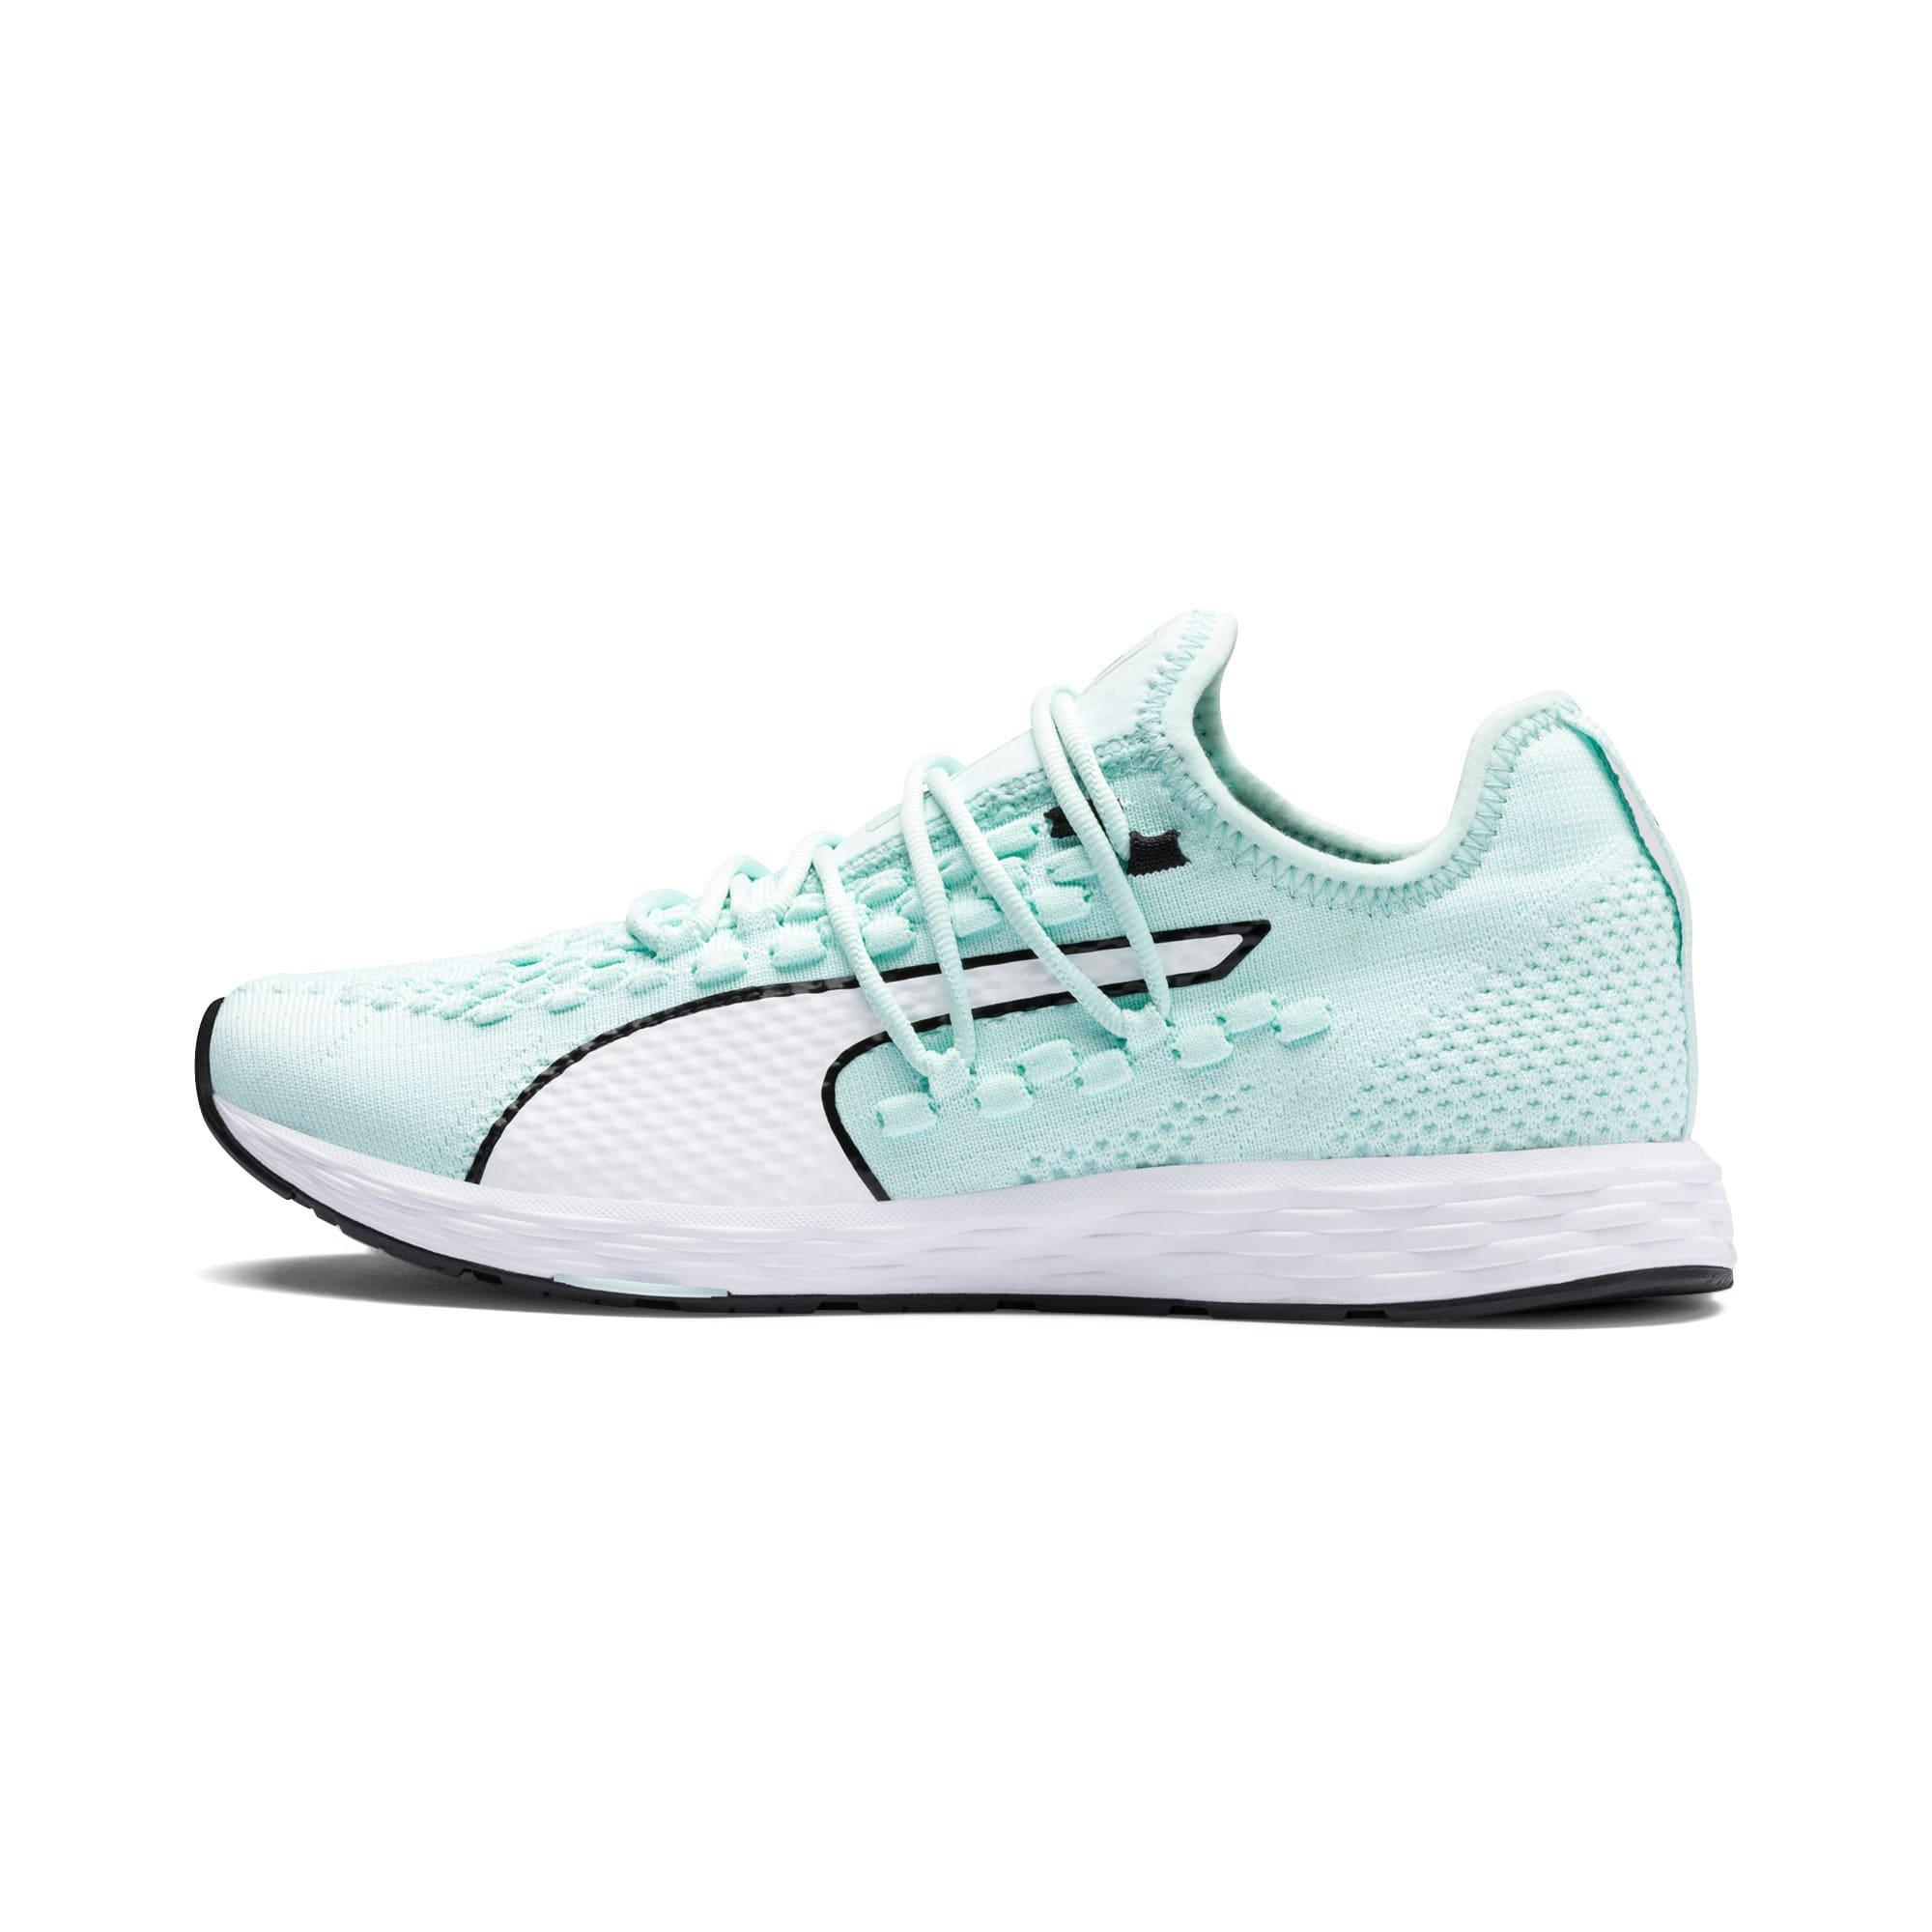 Thumbnail 1 of SPEED 300 RACER Women's Running Shoes, Fair Aqua-White-Black, medium